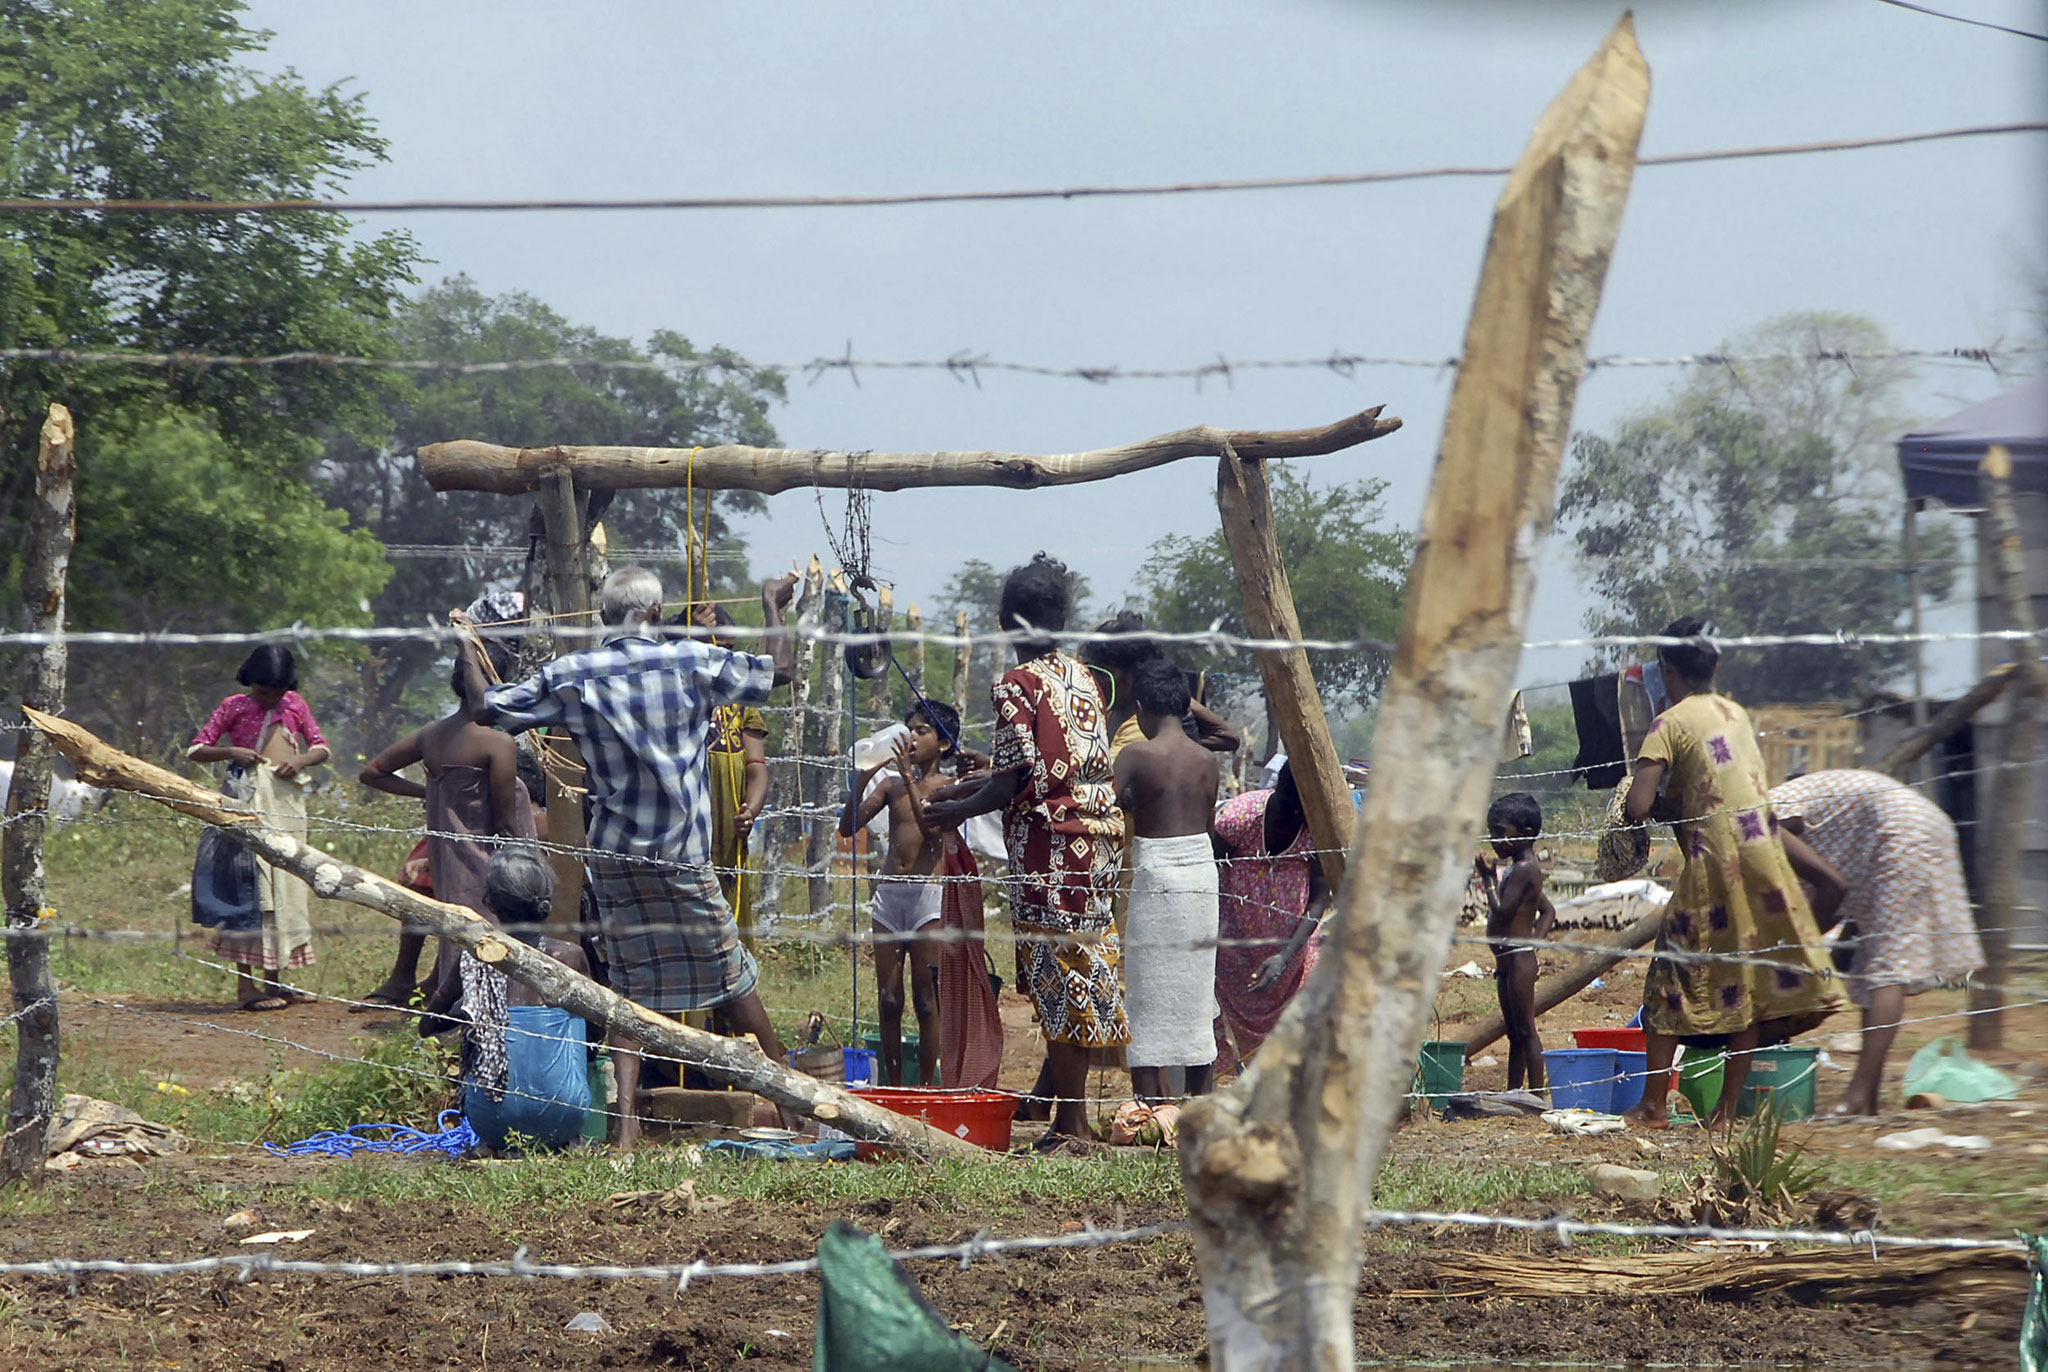 Desplazados internos civiles tamiles de Sri Lanka se reúnen alrededor de un pozo en un campamento de Manik Farm, Vavuniya, Sri Lanka (2009). AP Photo